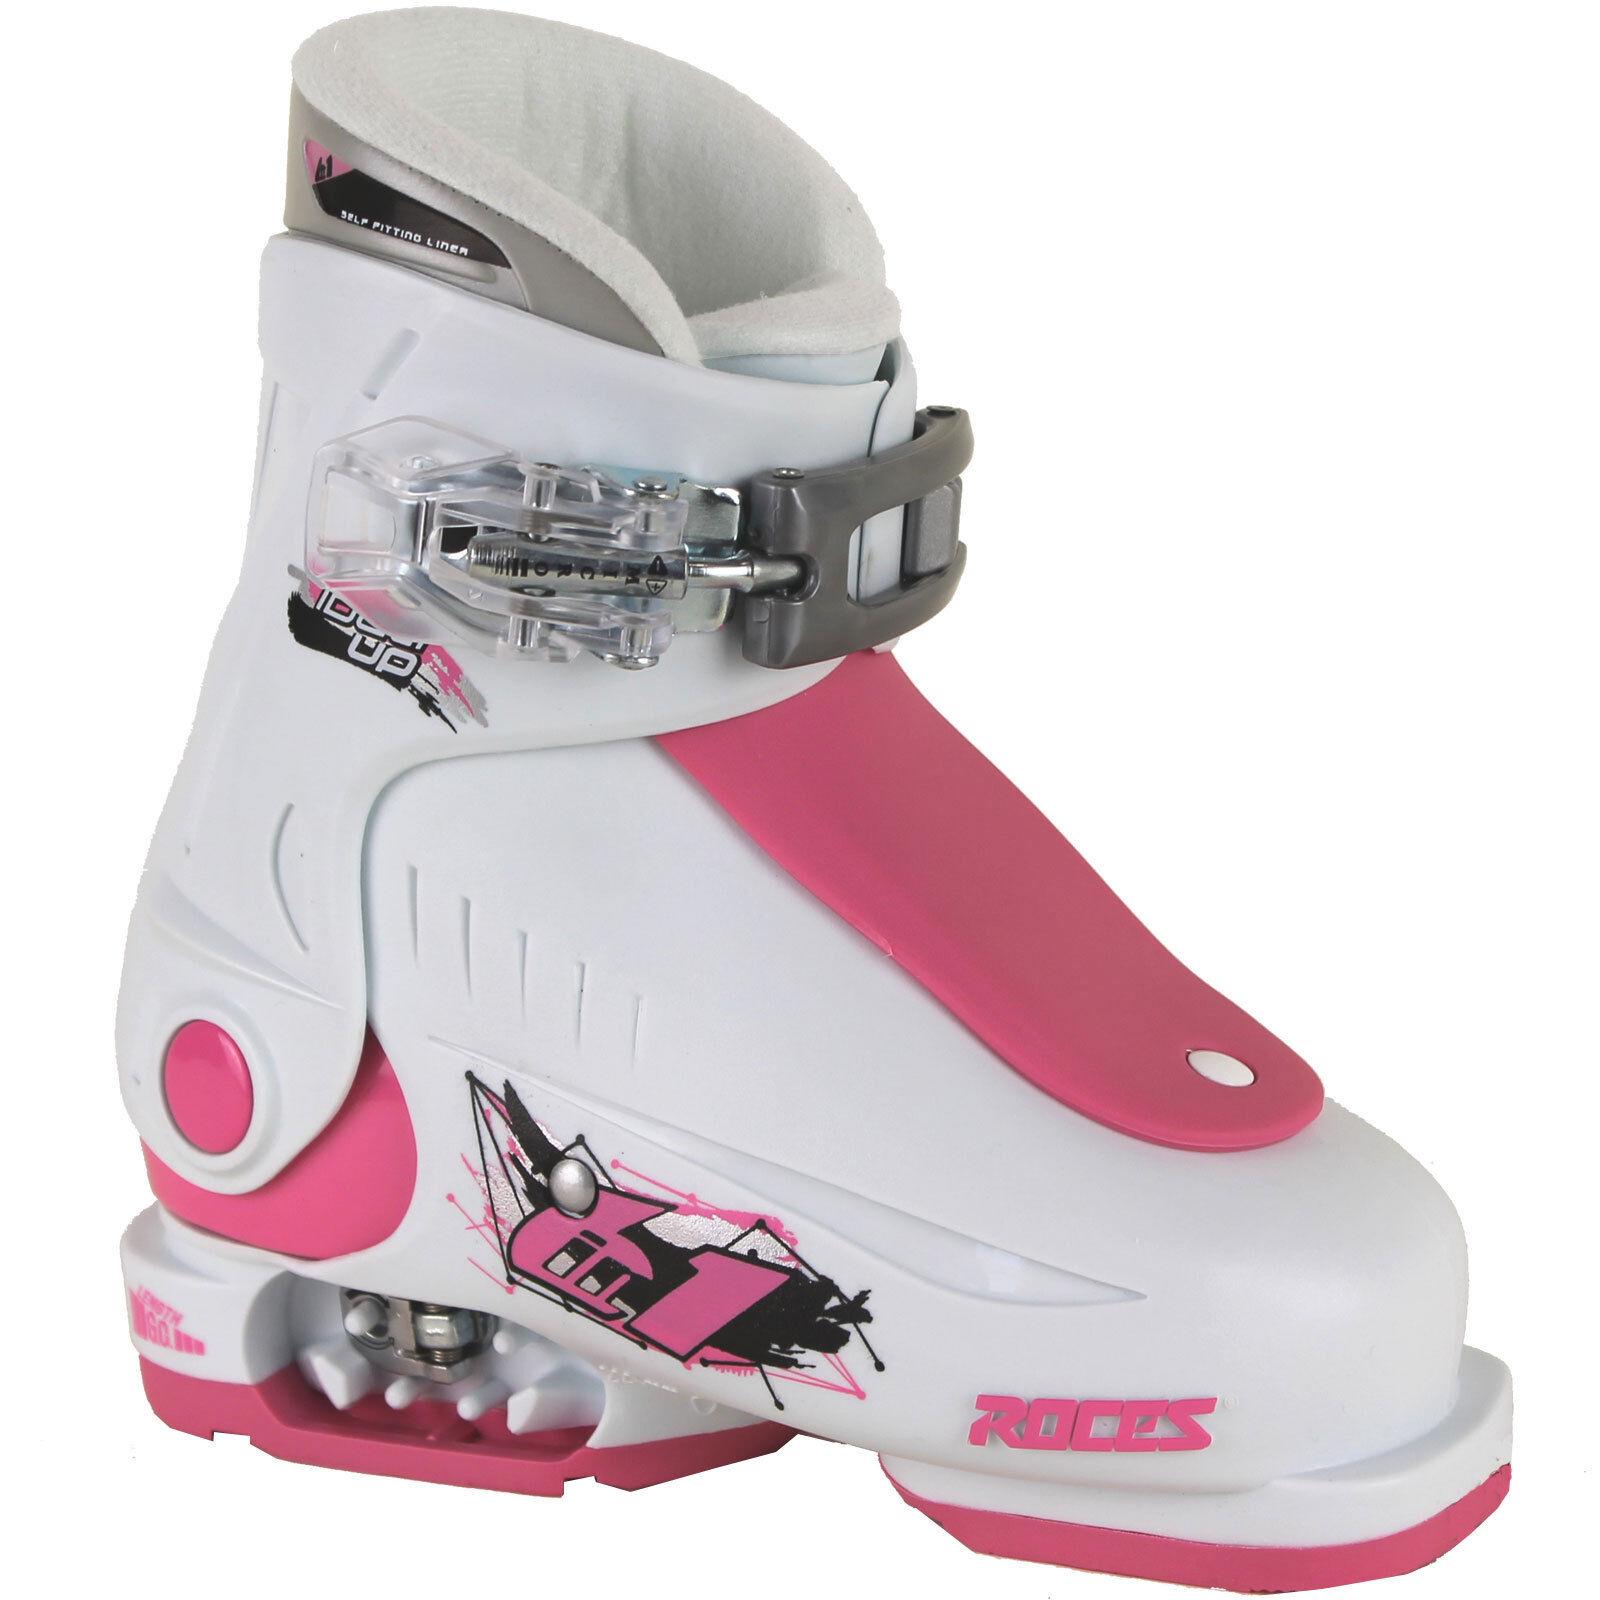 White/Deep Pink (450490)